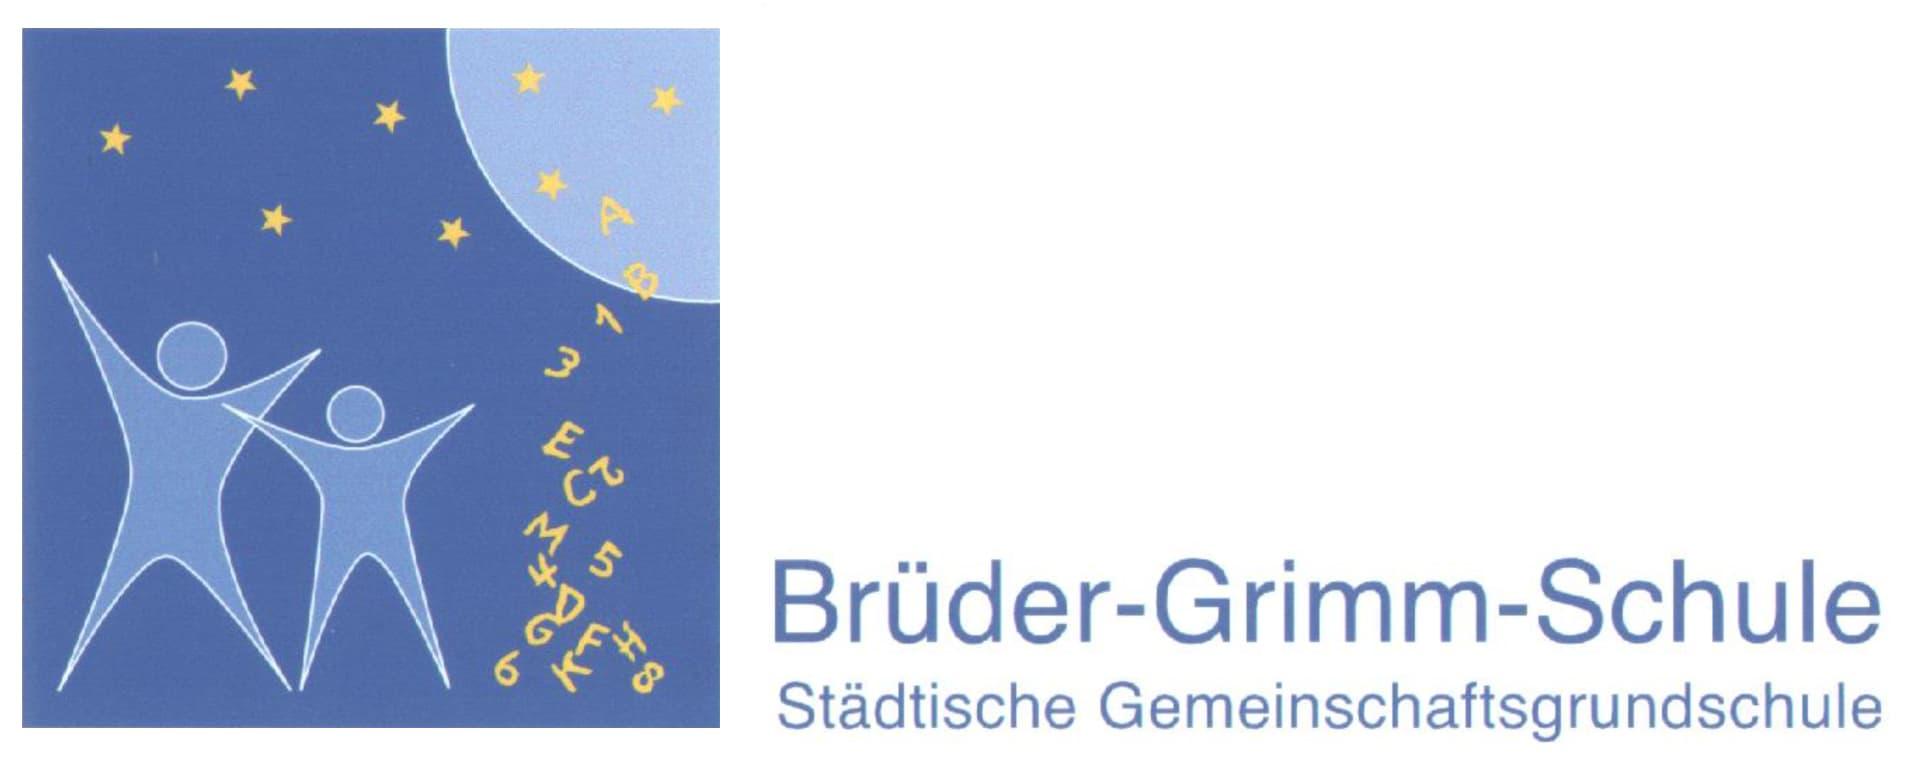 Brüder-Grimm-Schule